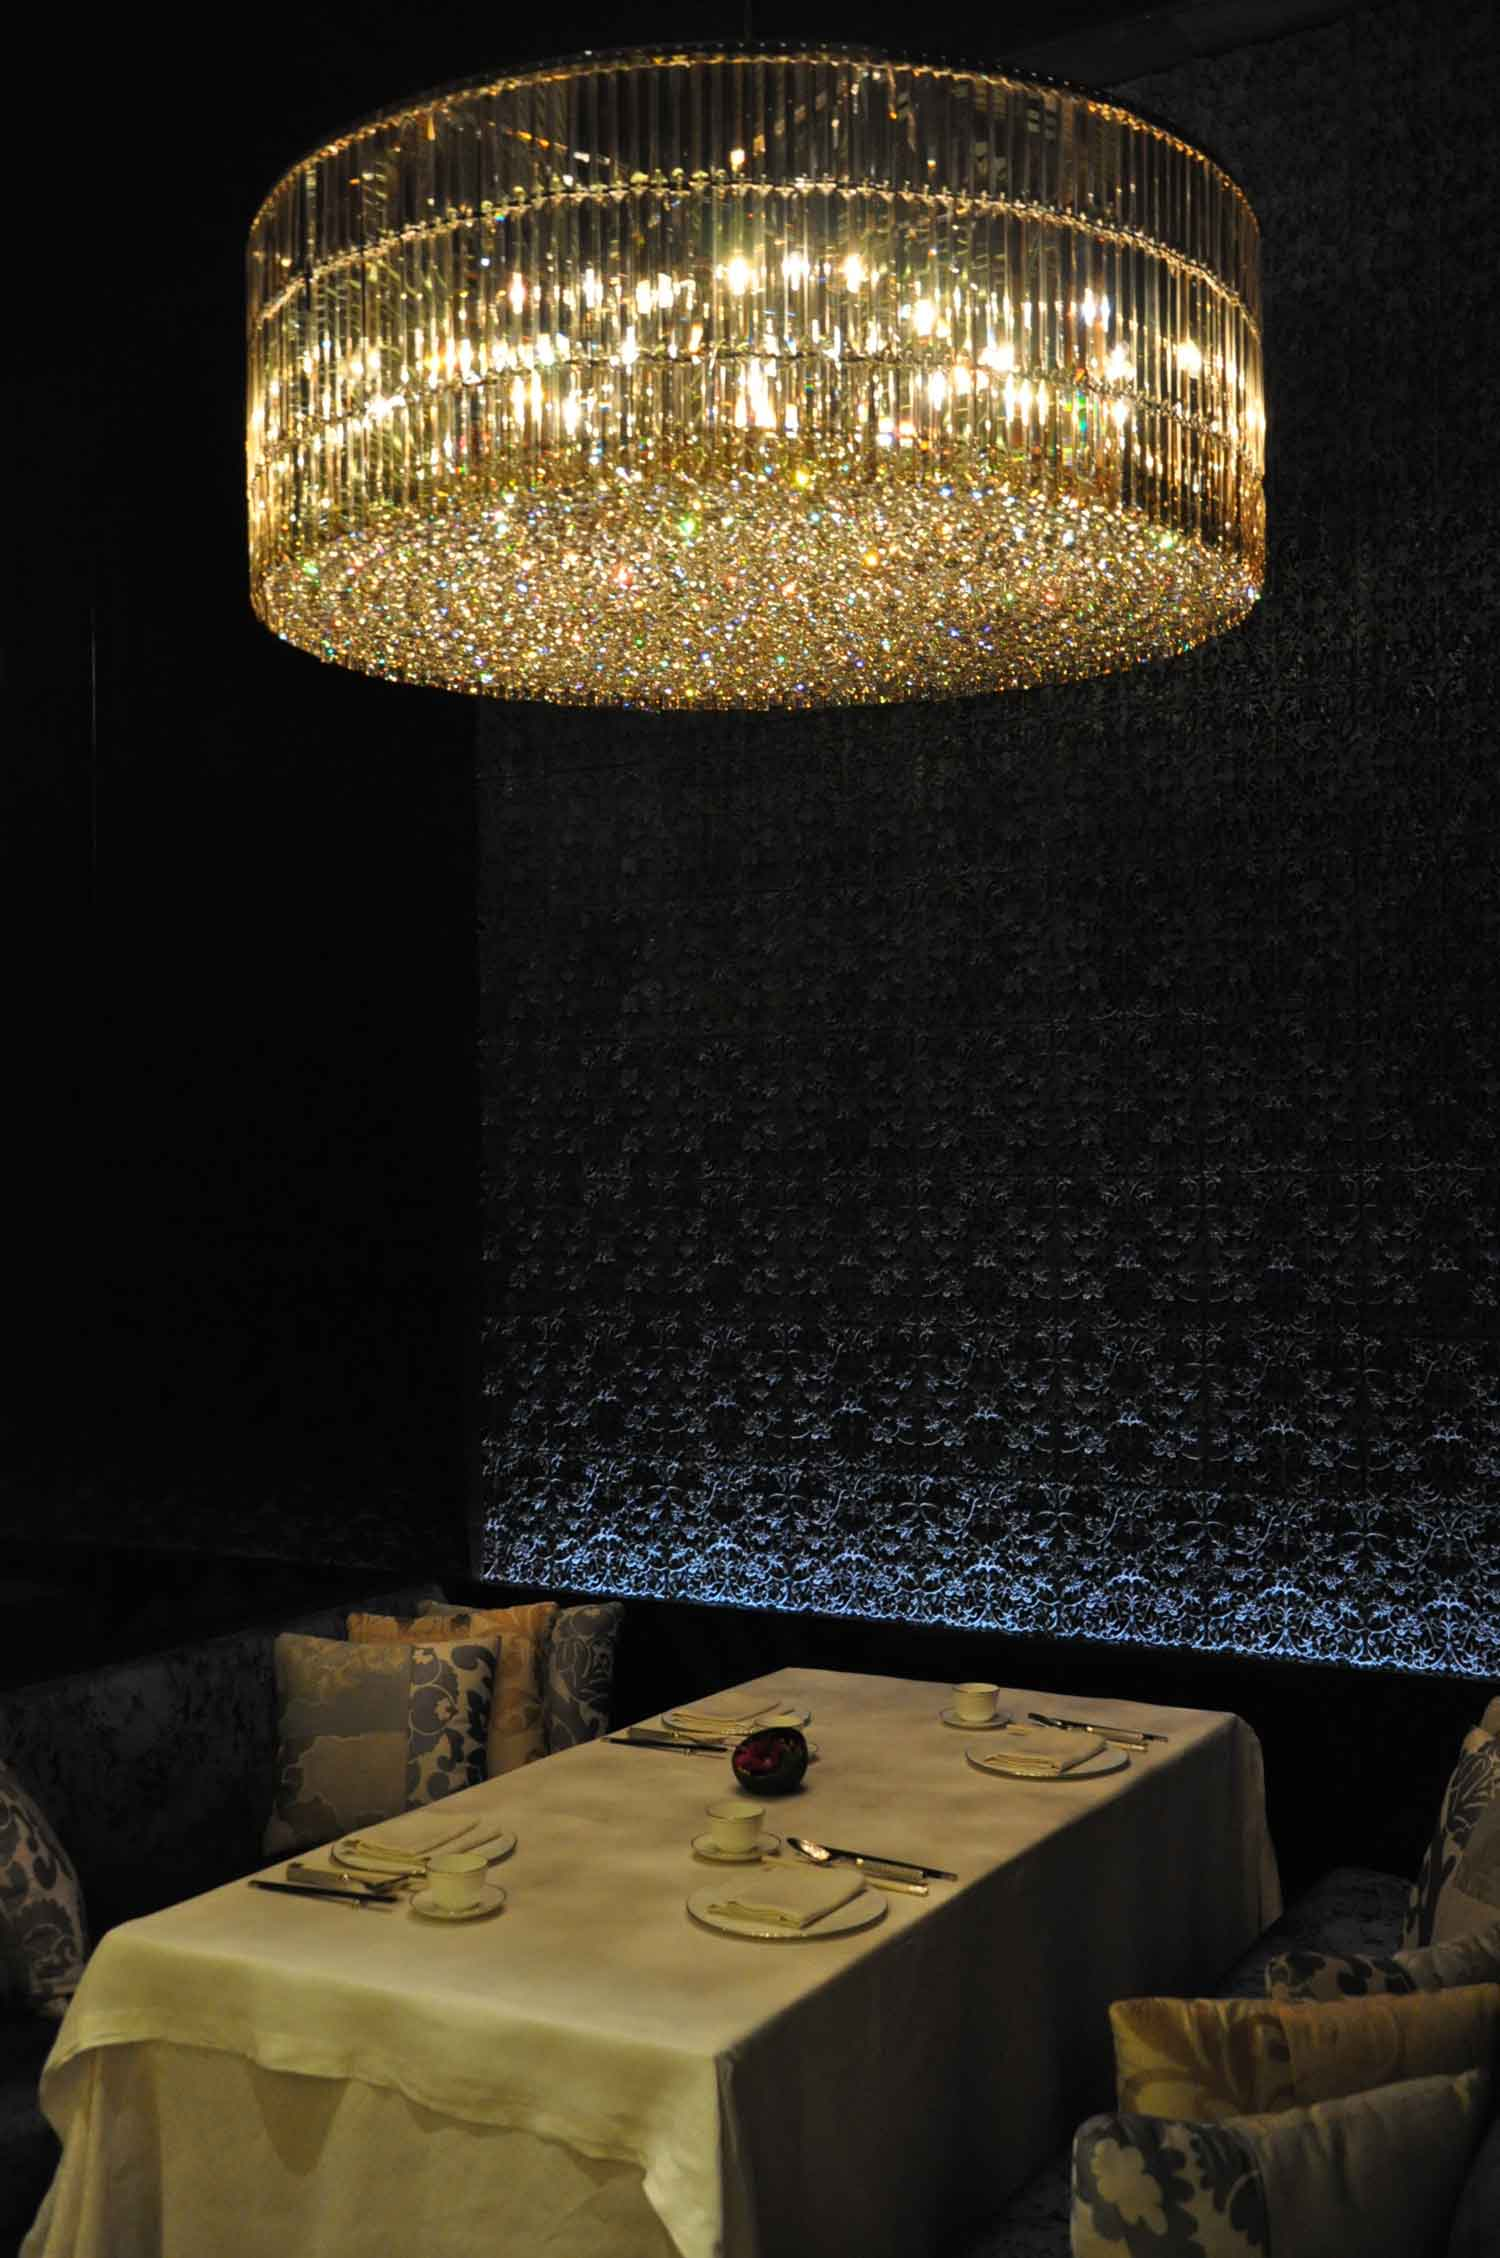 Lai Heen Macau table and chandelier